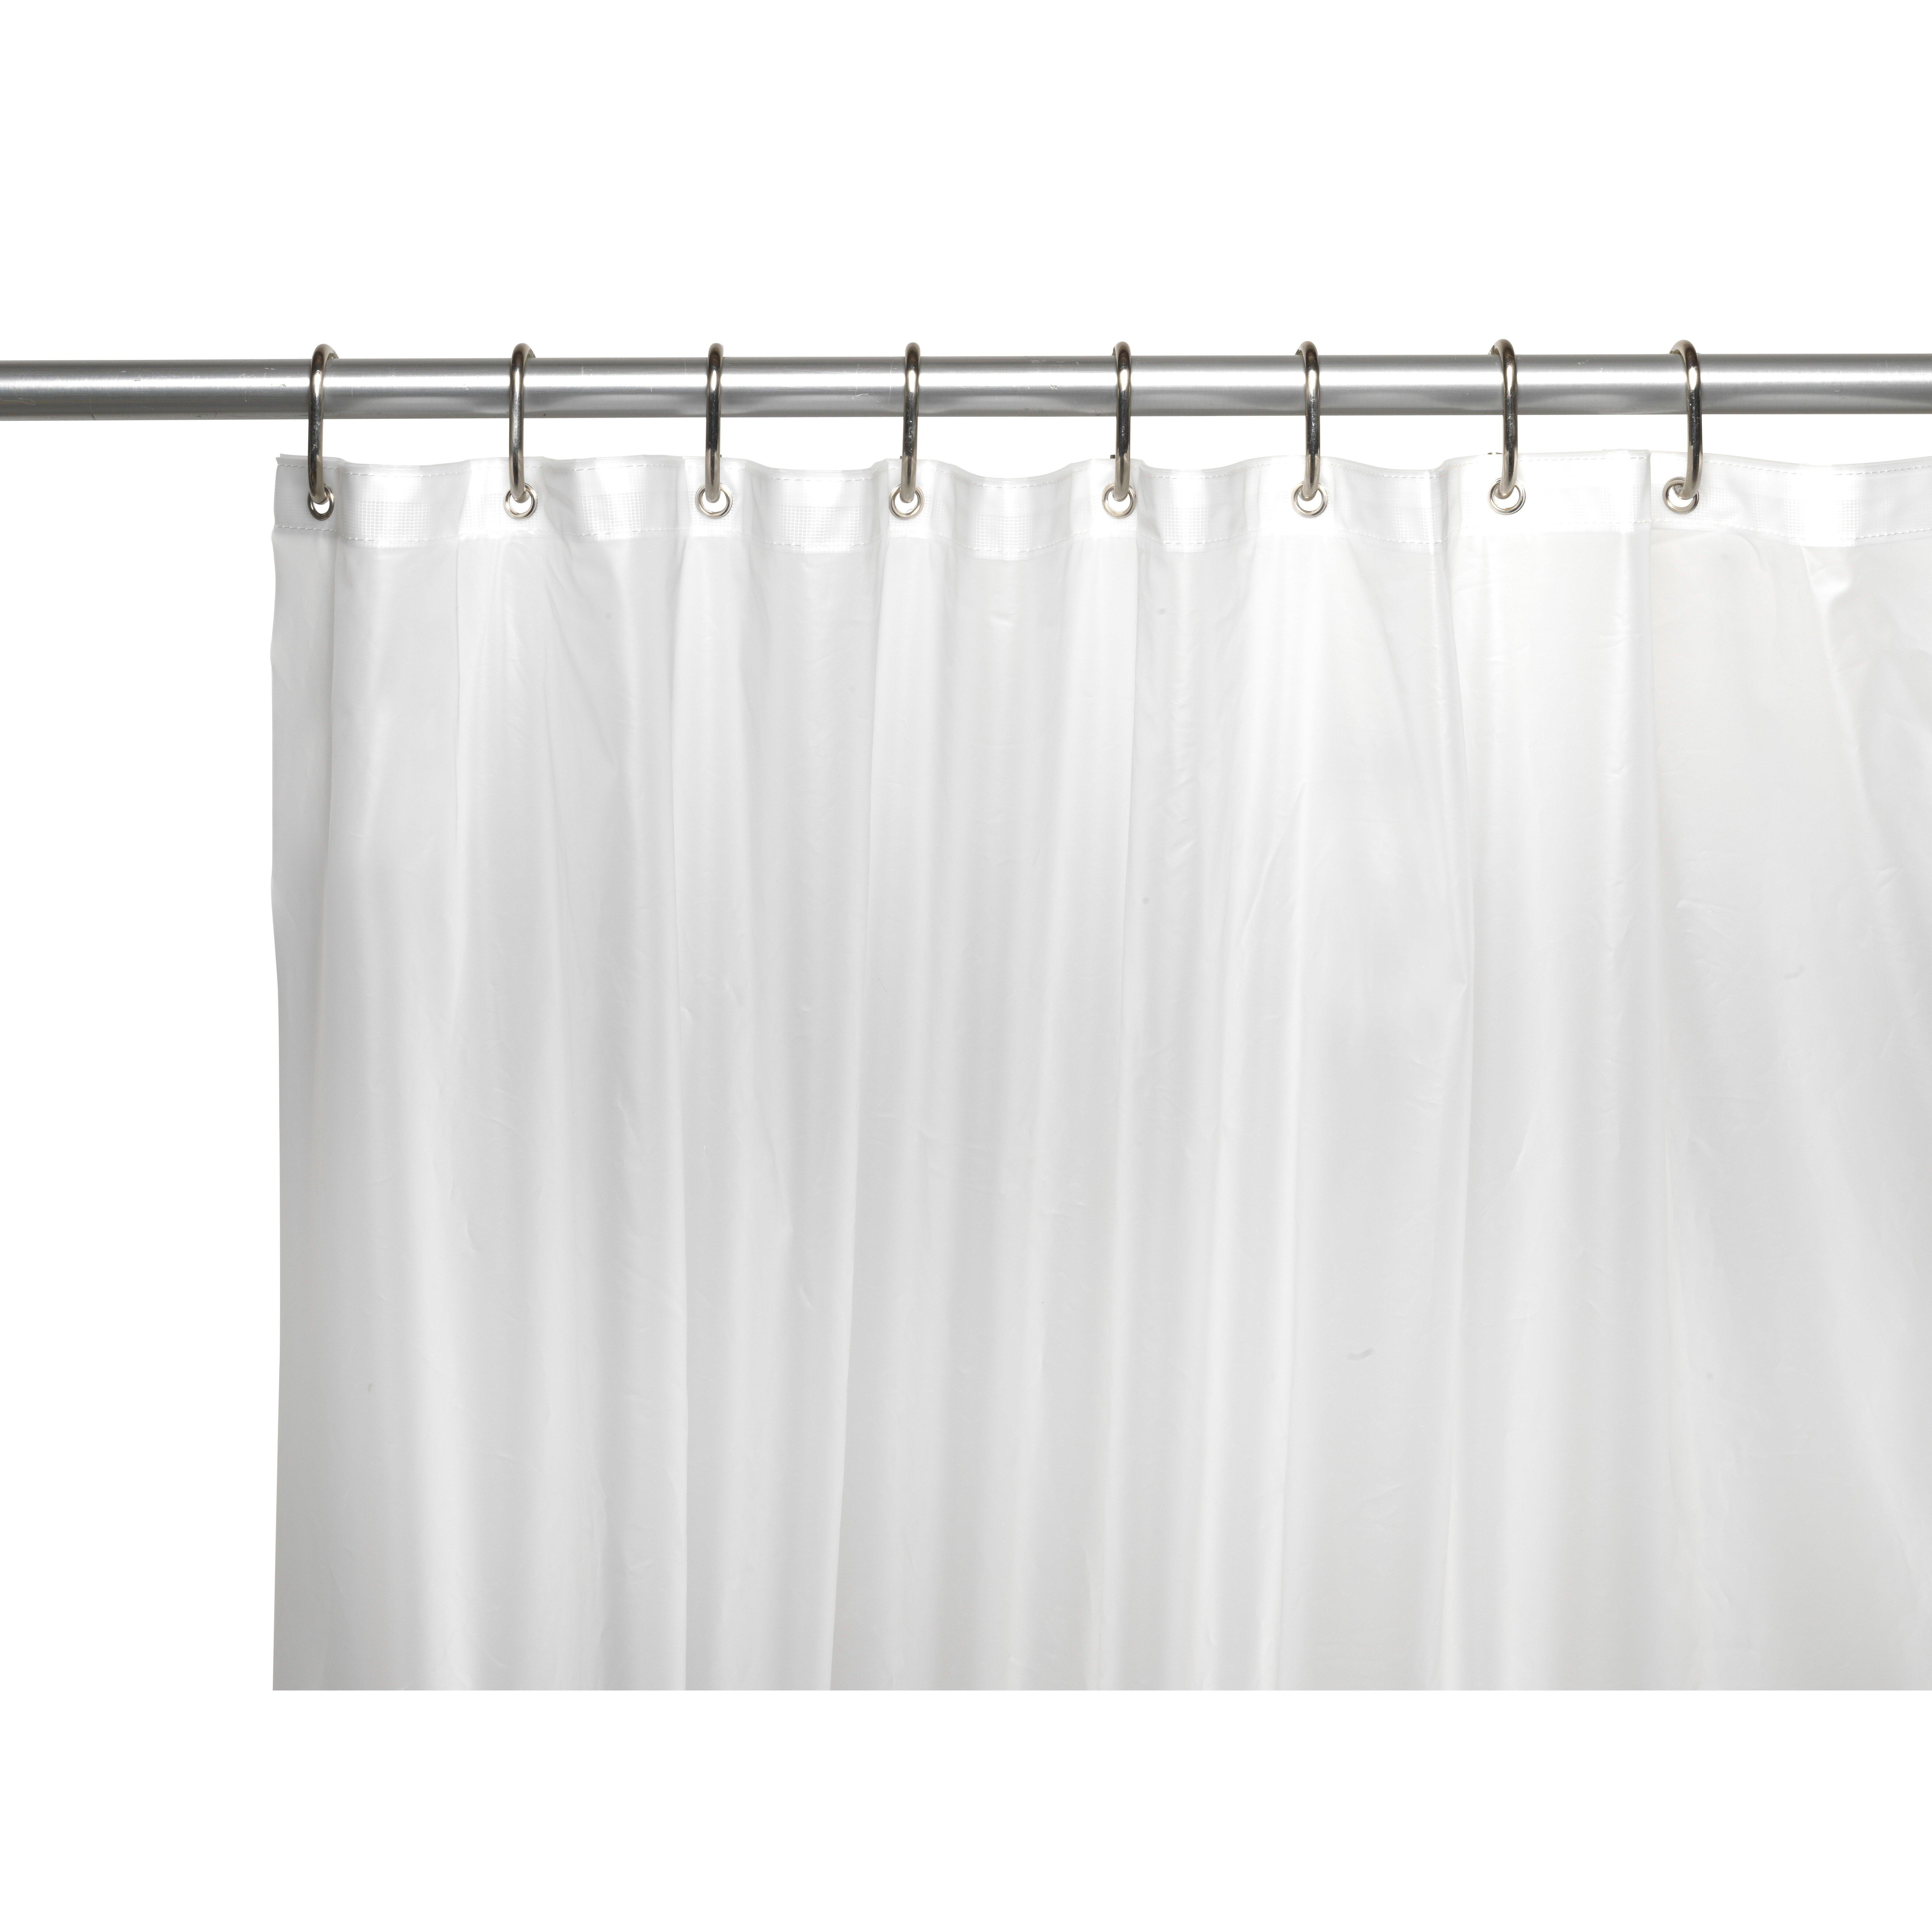 Ben And Jonah Clean Home Peva Shower Curtain Liner Reviews Wayfair